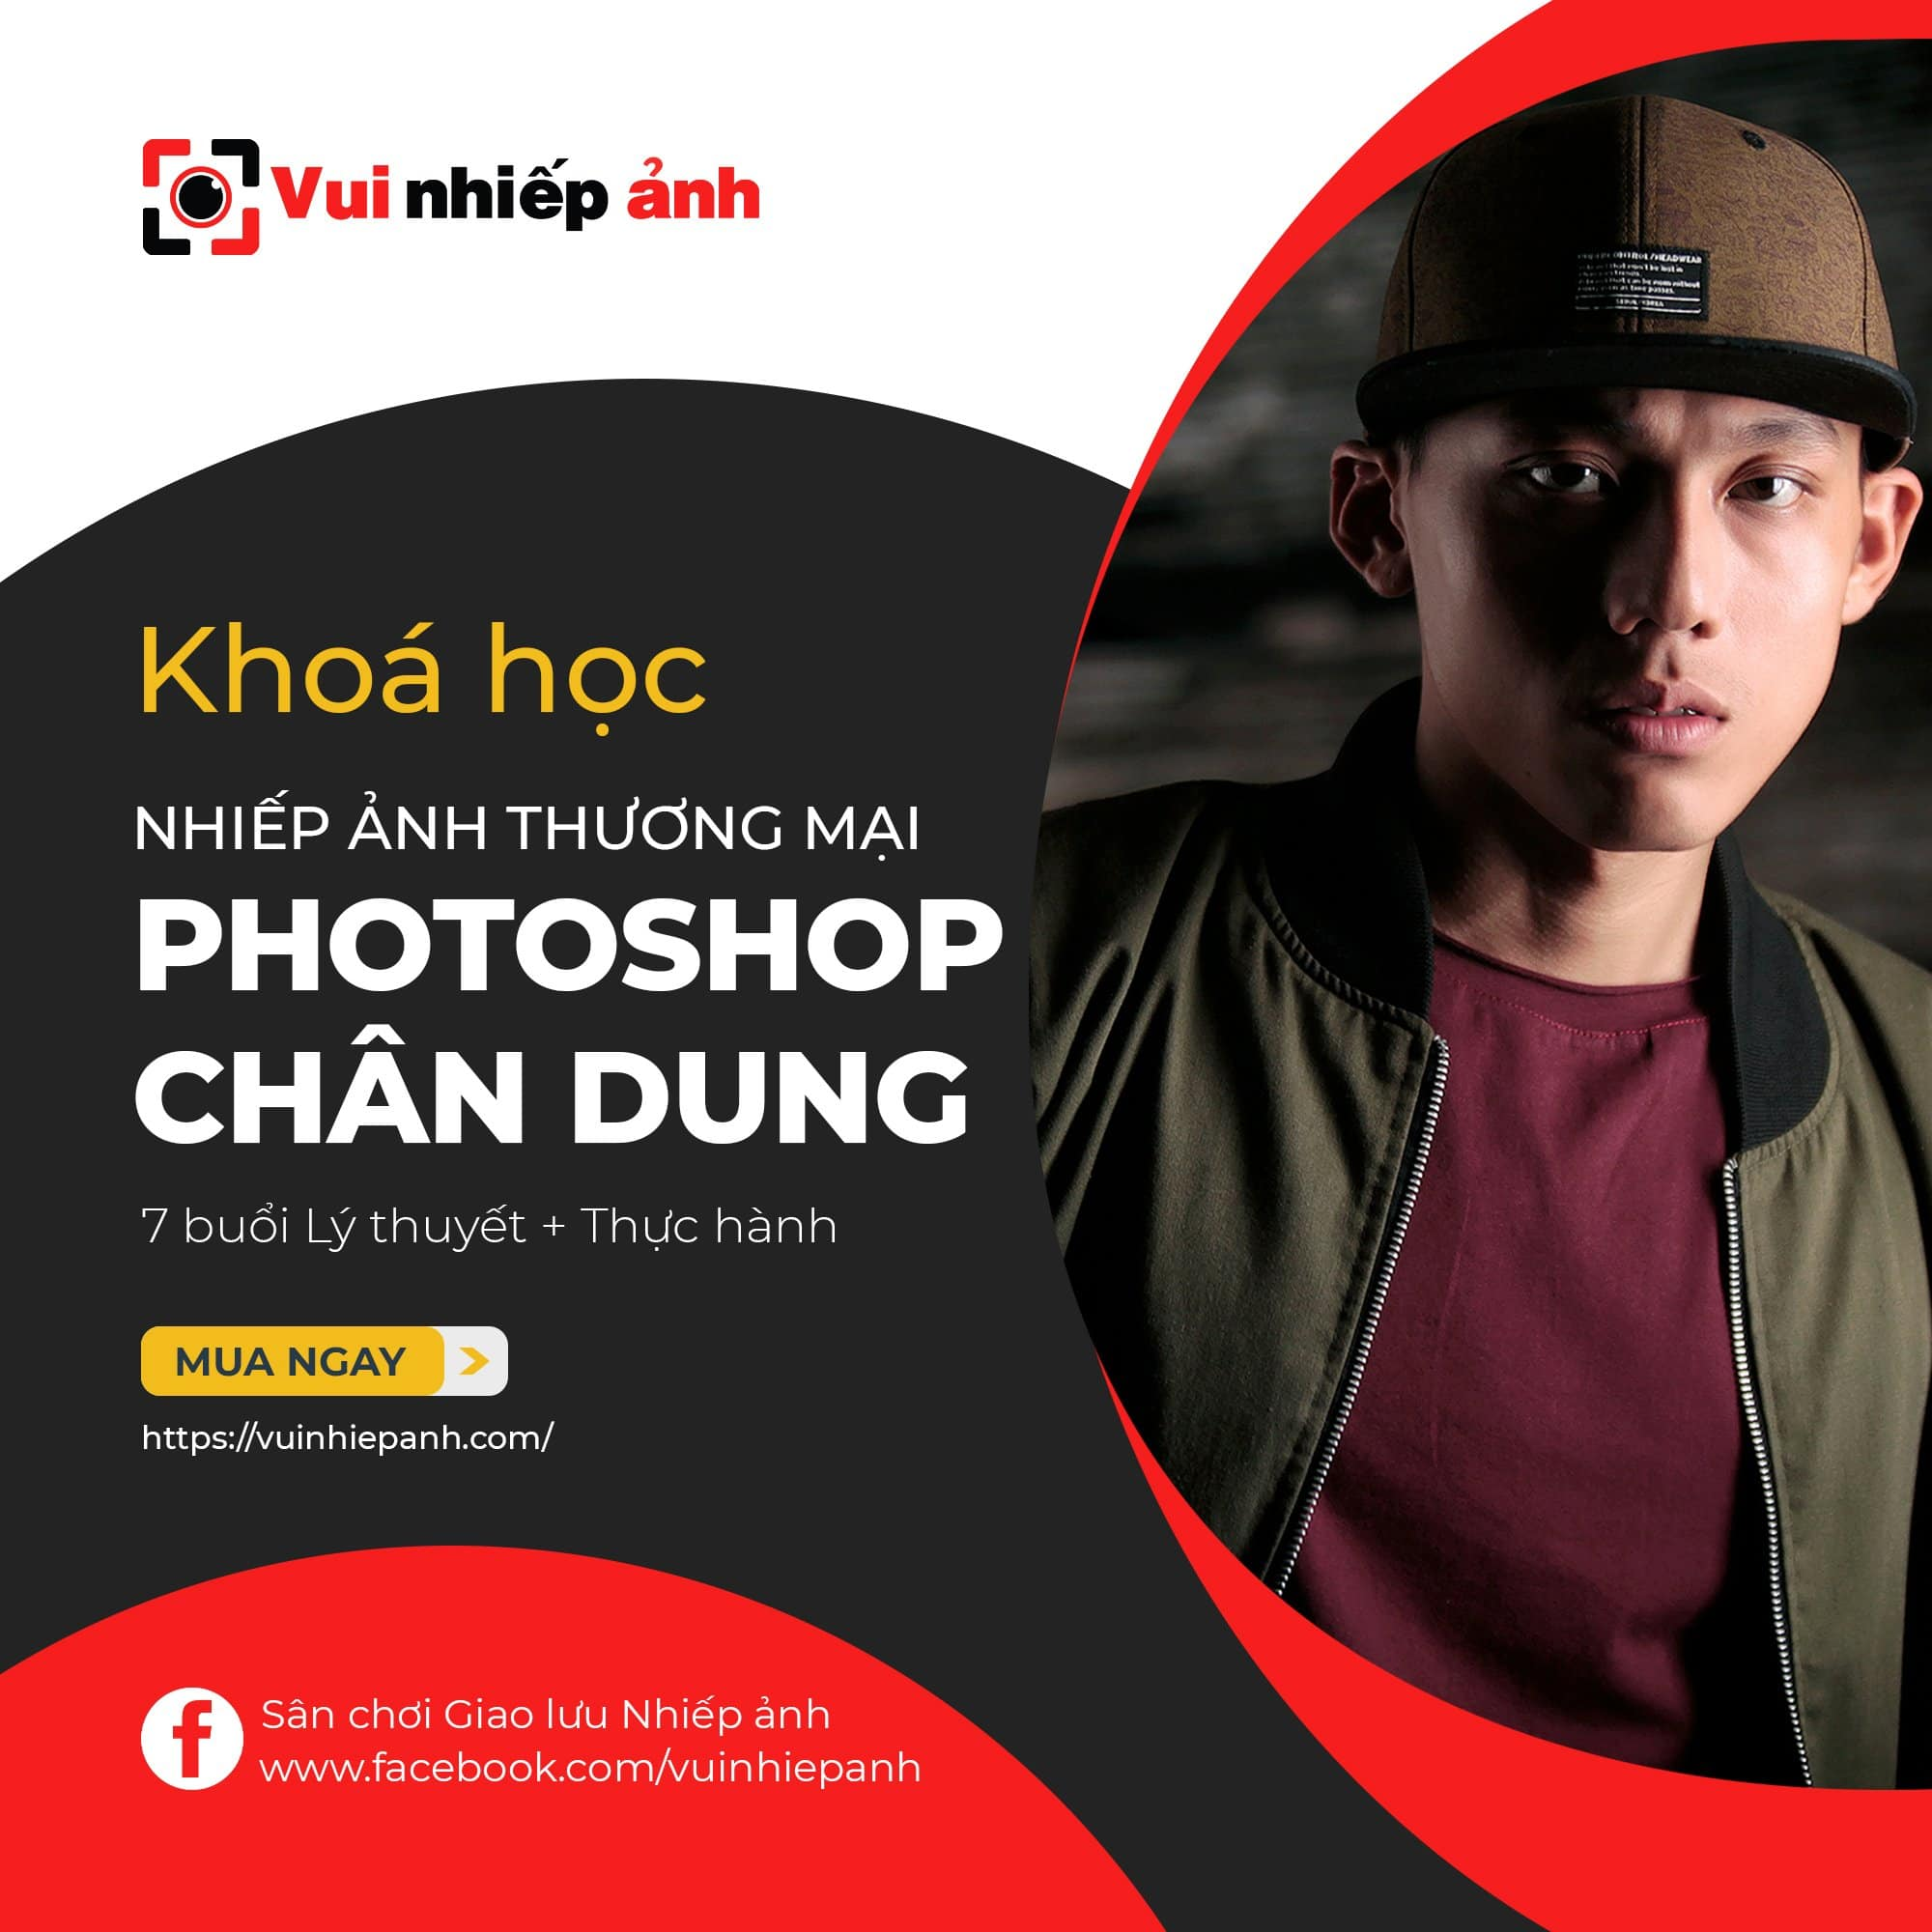 Photoshop chân dung – NAG. Hafoto